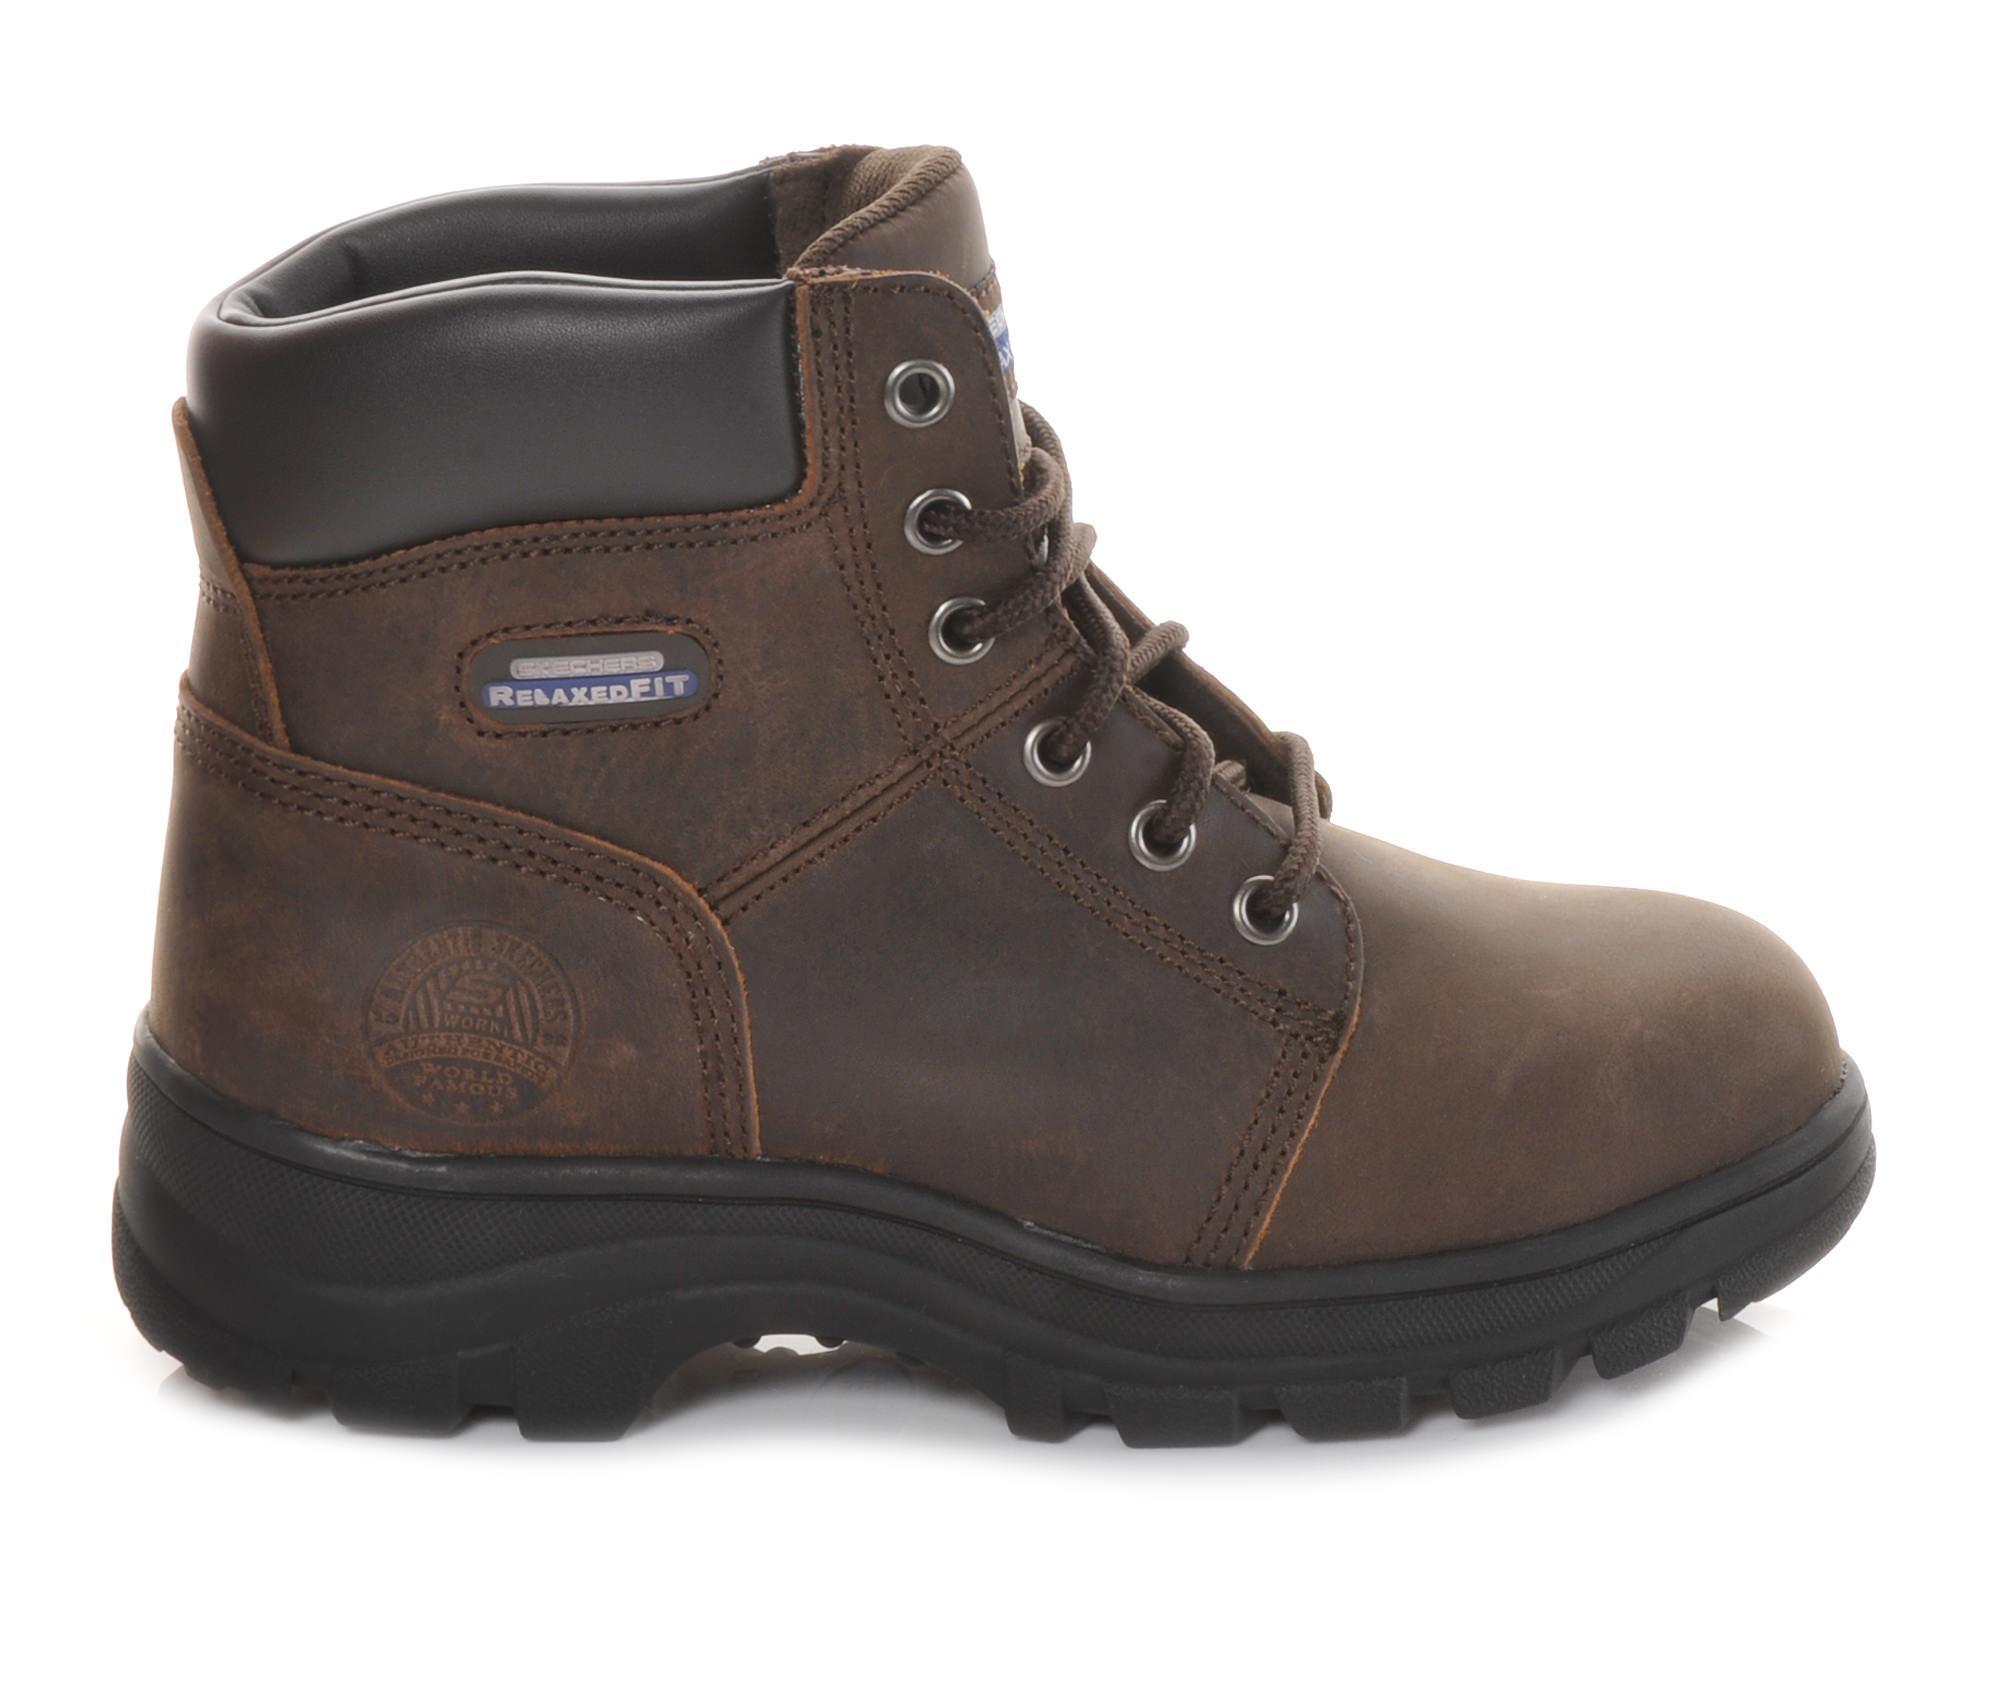 Skechers Work Workshire Peril 76561 6 In Steel Toe Men's Boots (Brown Leather)